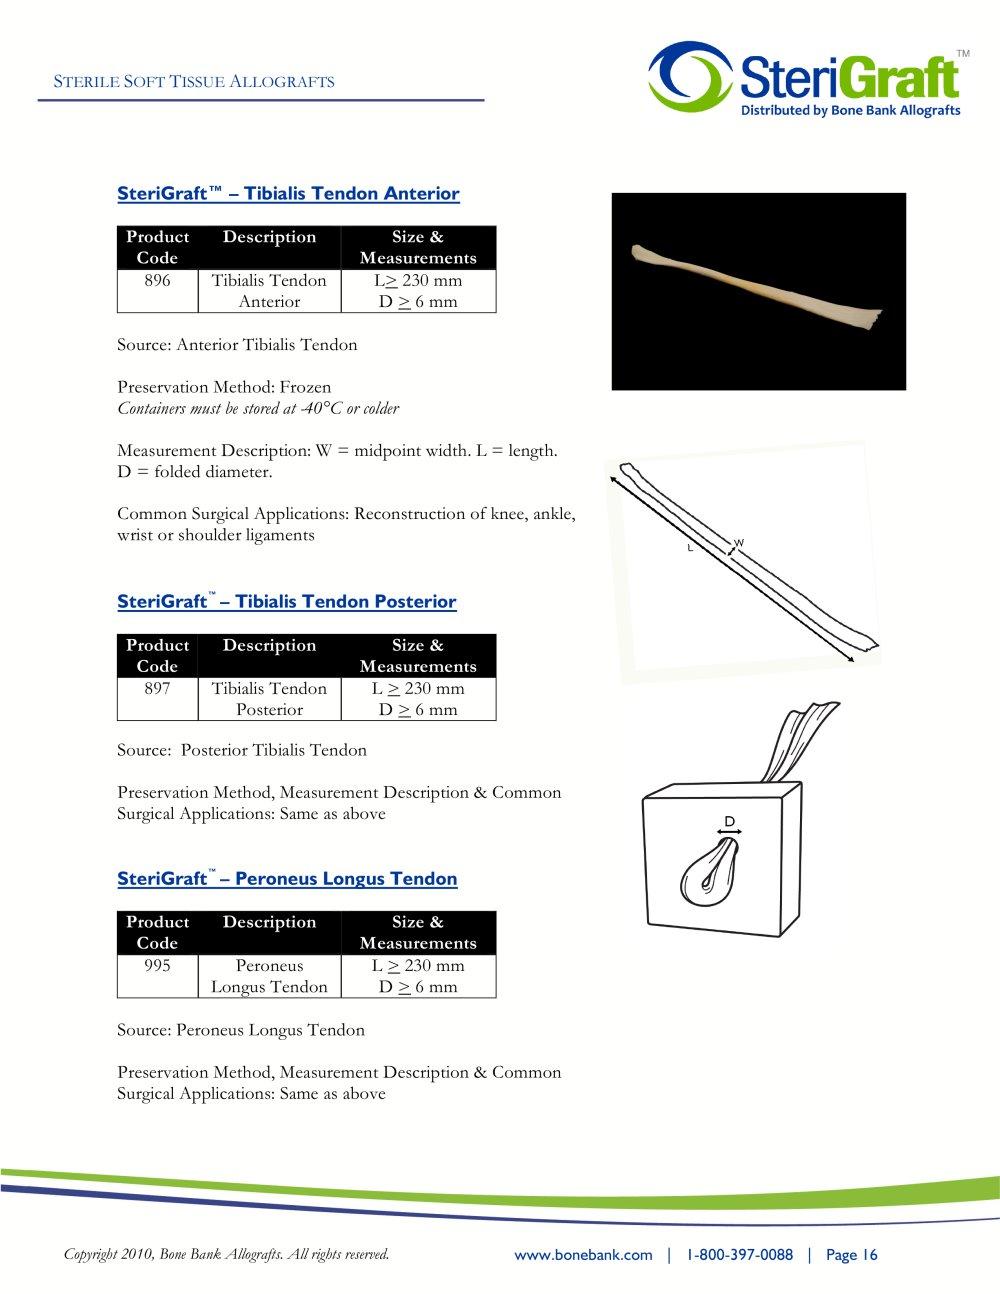 Sterigraft Tibialis Tendon Anterior Bone Bank Allografts Pdf